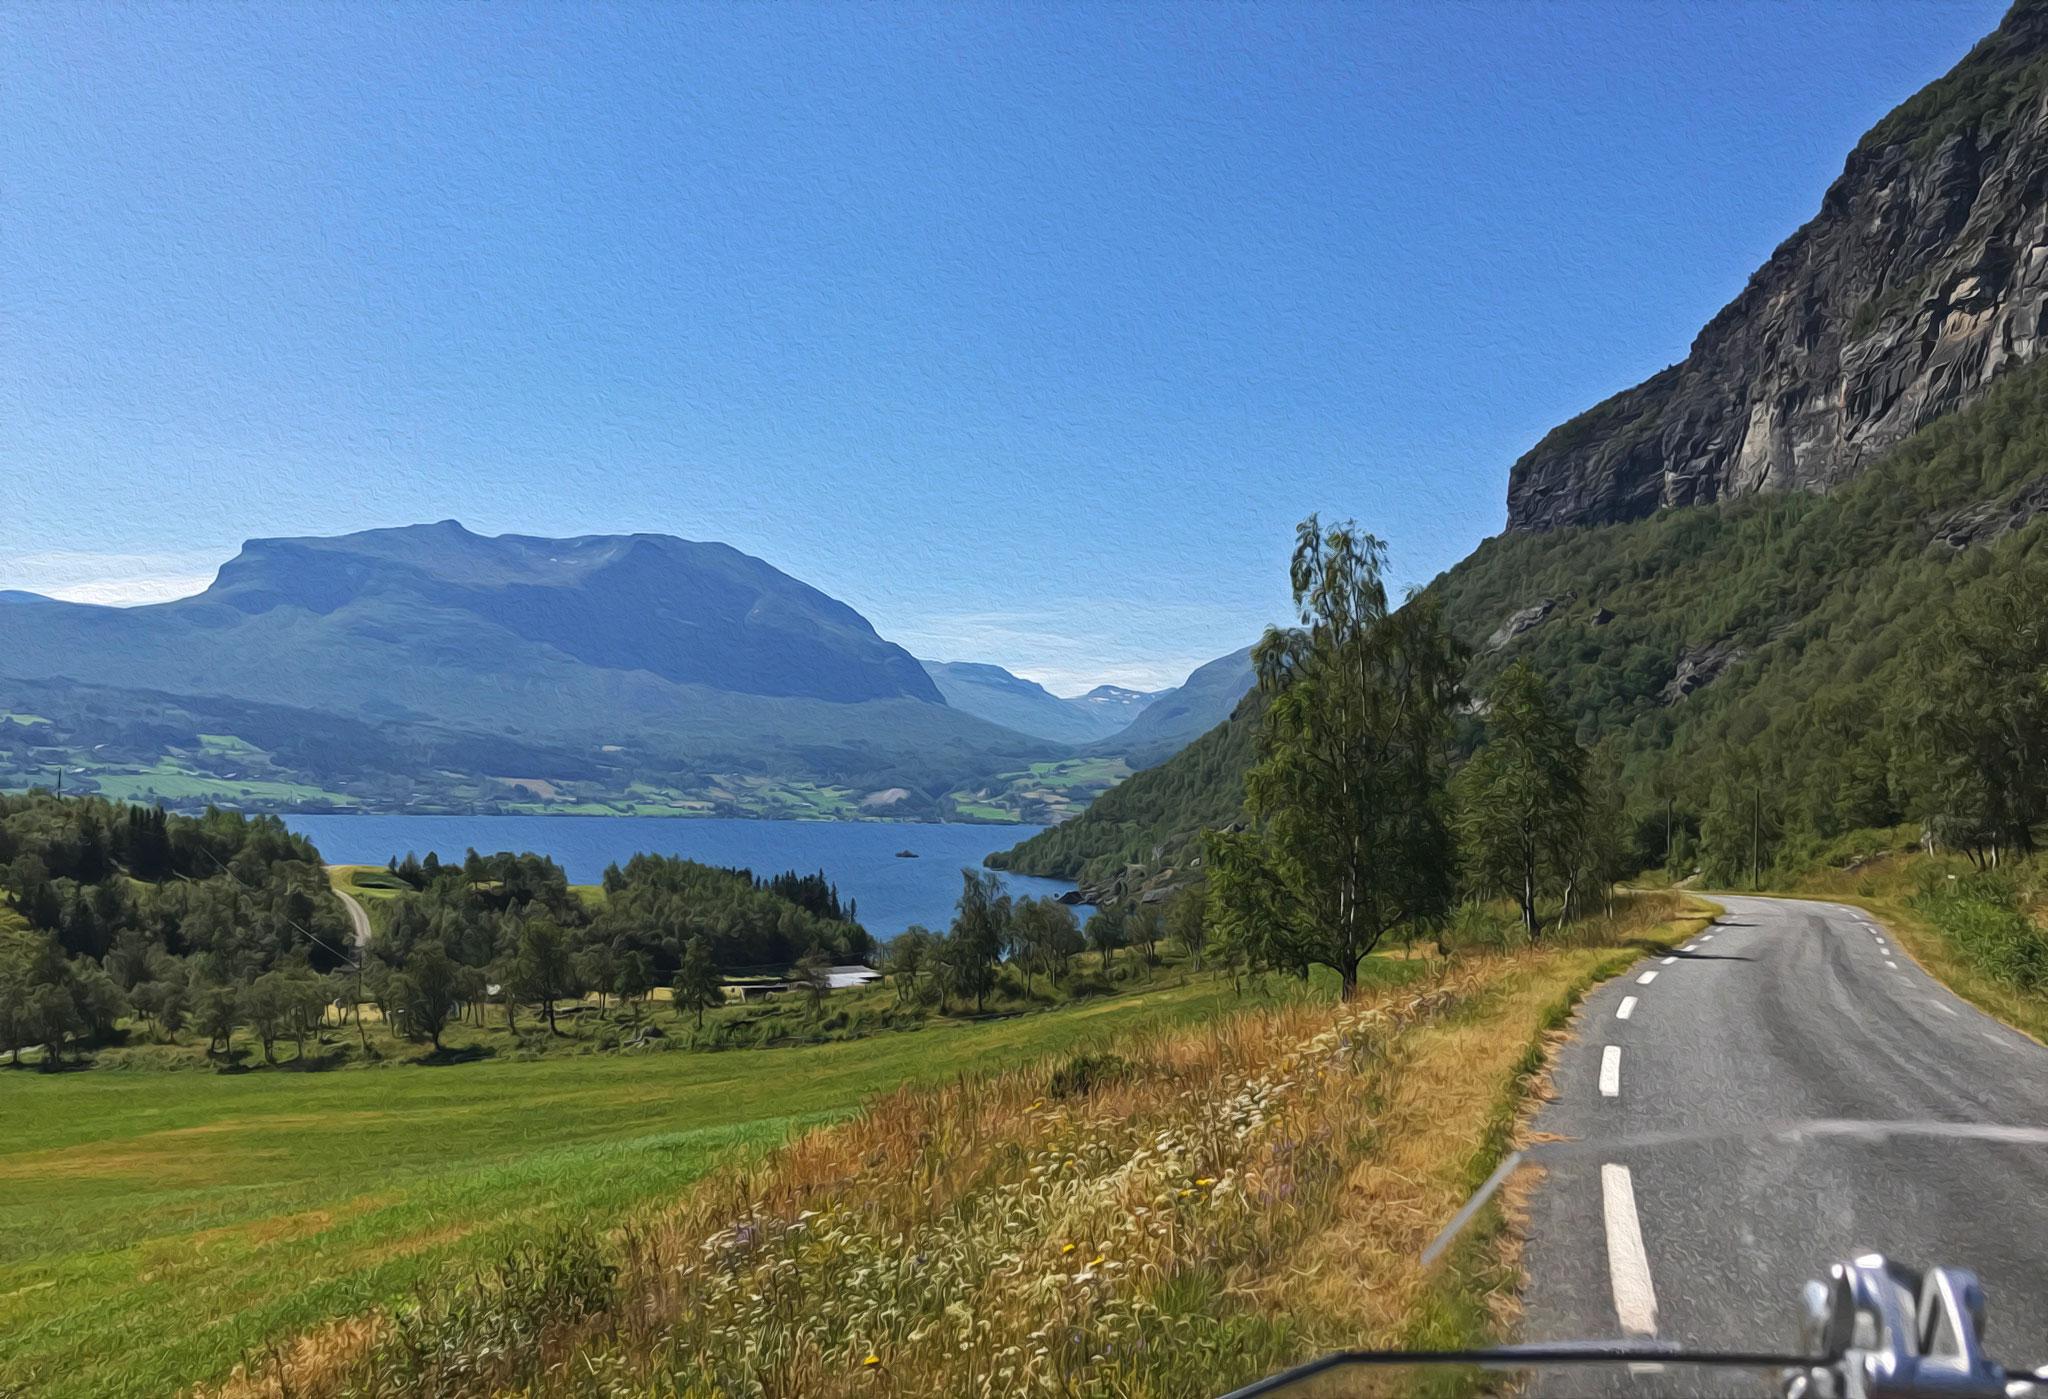 Along Vennisvegen. View to lake Vangsmjøse and some prettty mountains